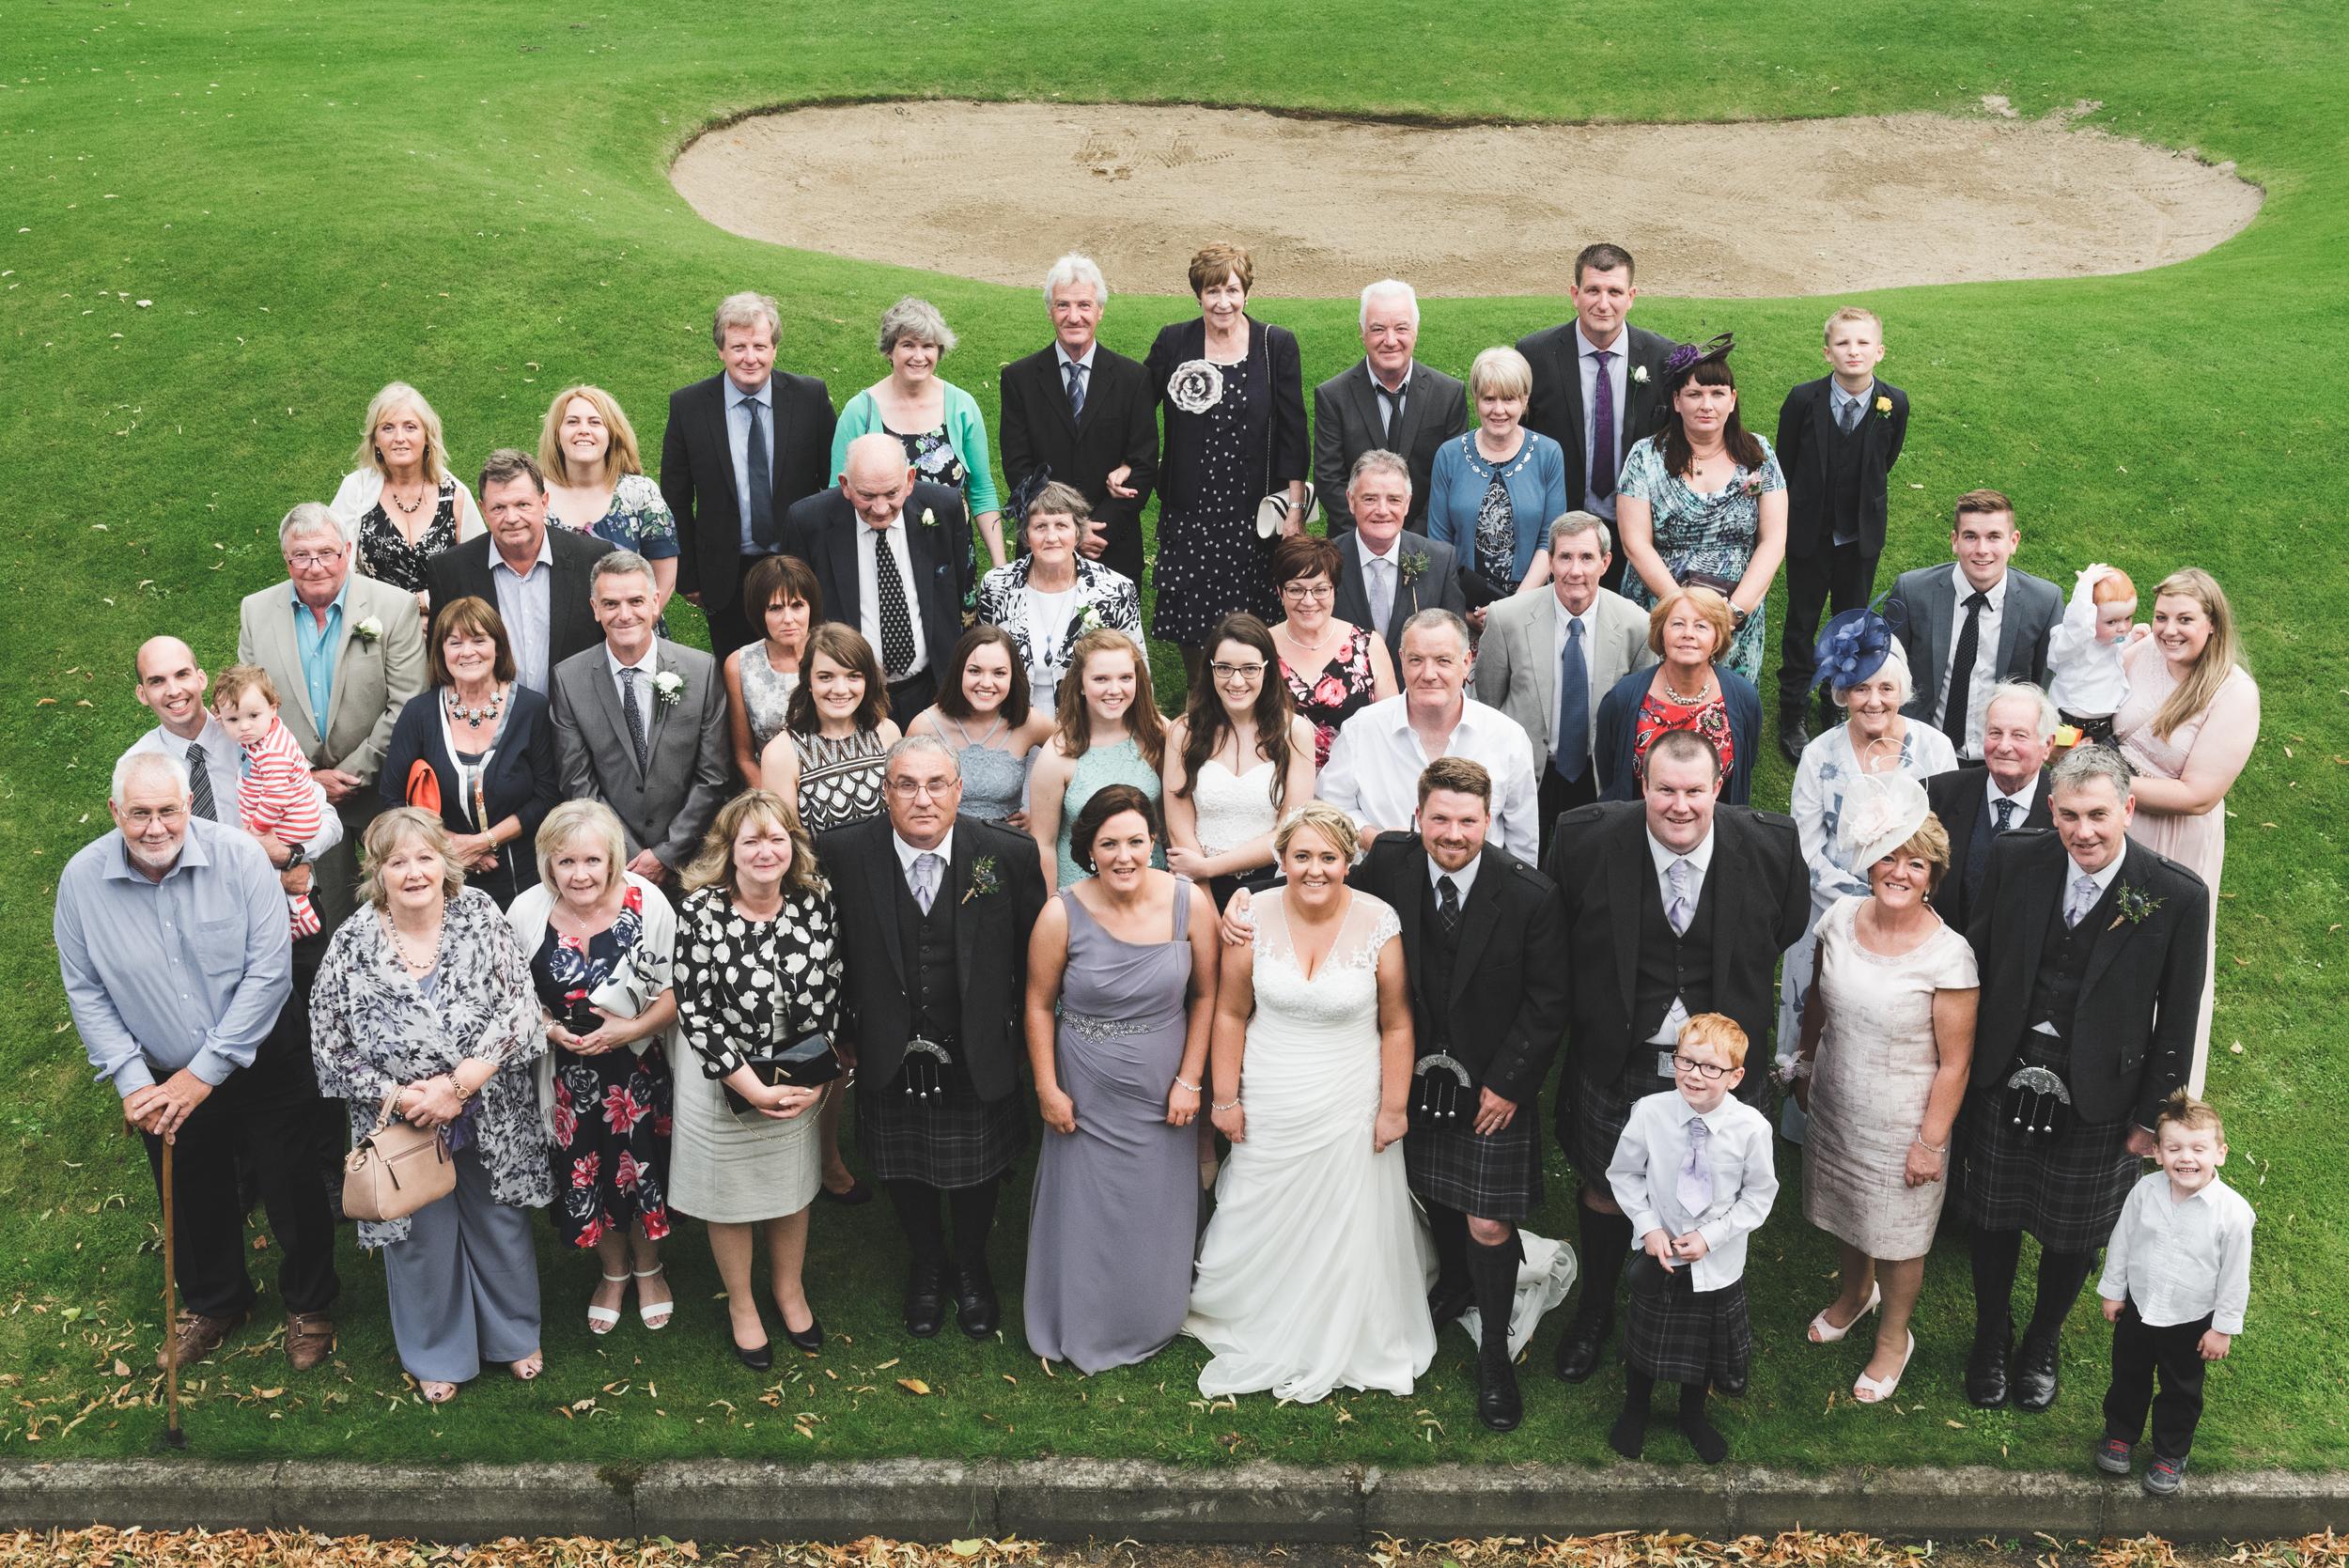 Lisburn Wedding Photographer Pure Photo N.I Edenmore Country Club group photo